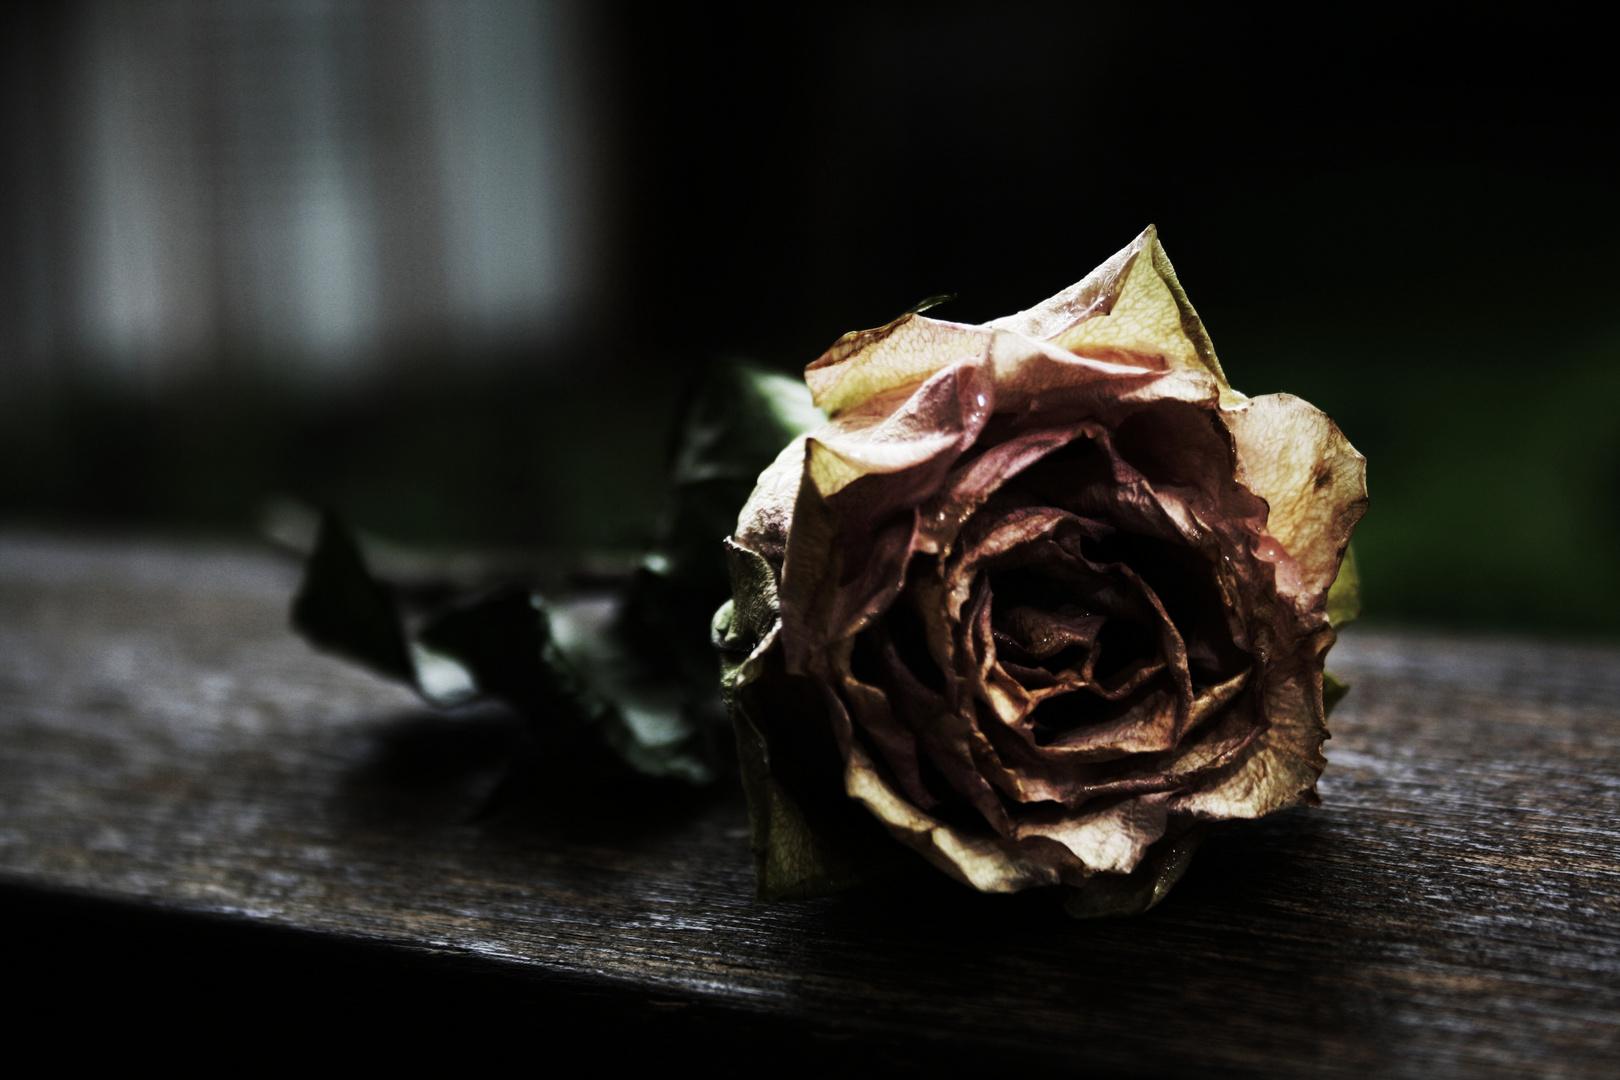 parched rose